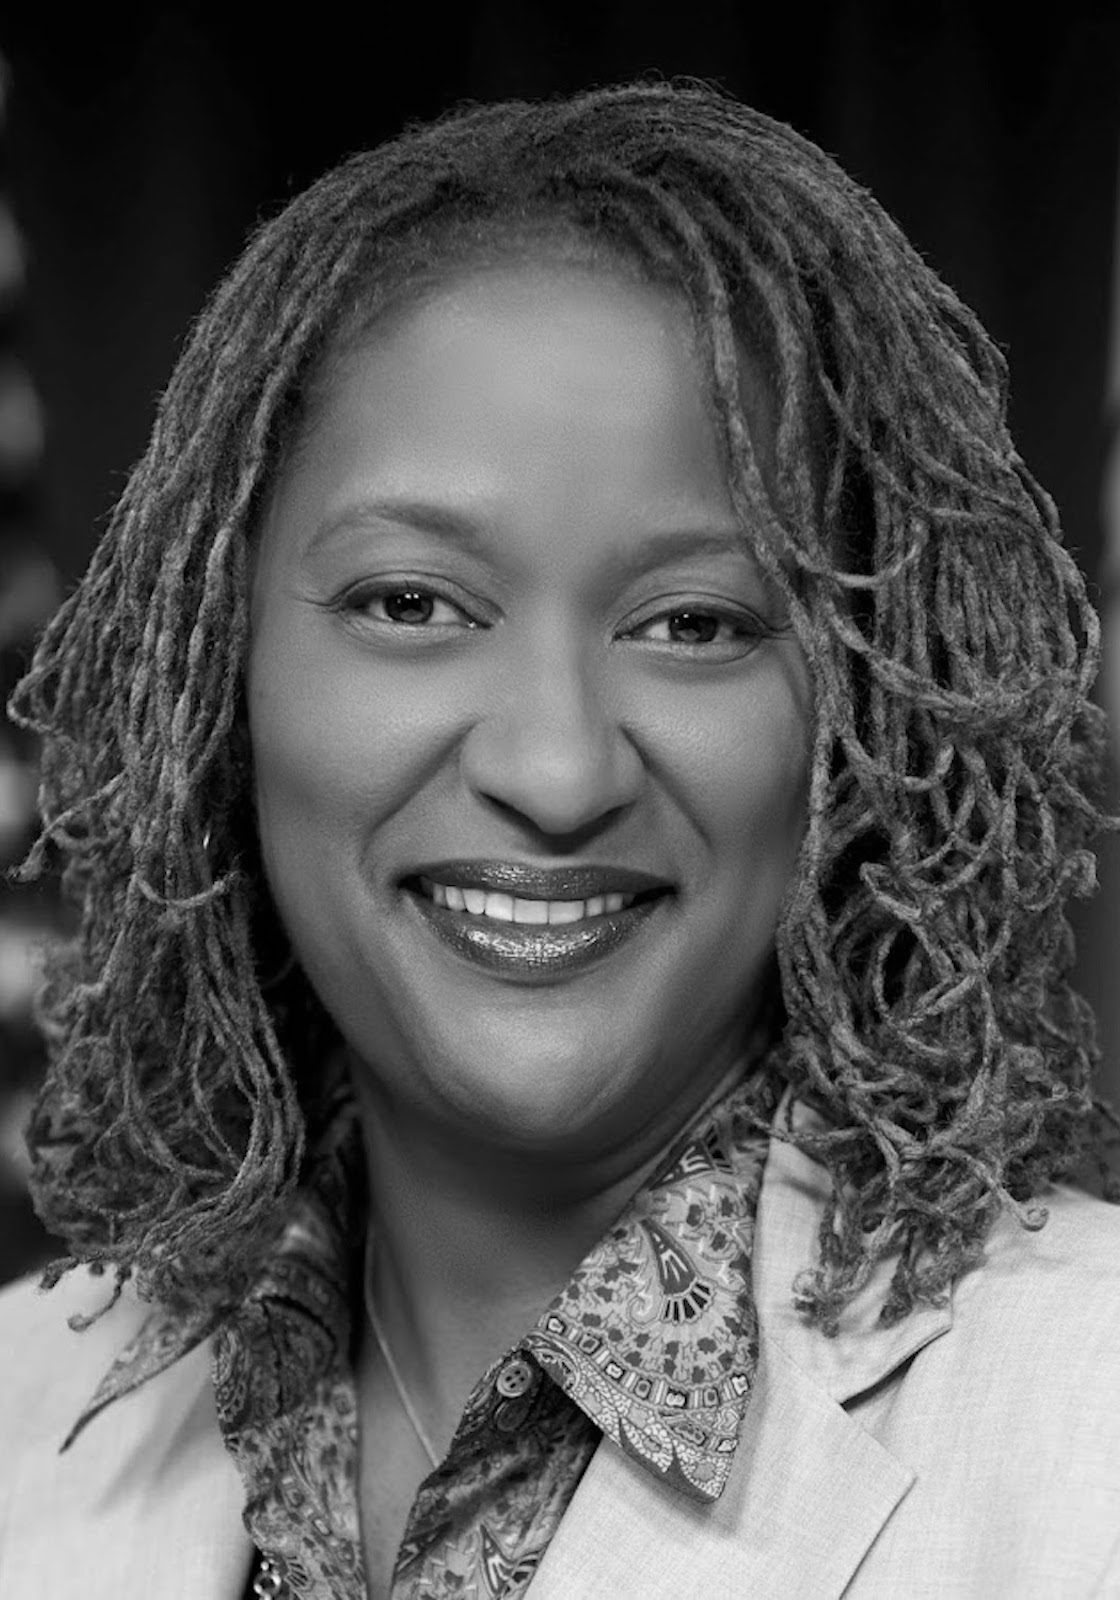 Holly Mitchell, Willoughby Avenue, The Five Fifths, KOLUMN Magazine, KOLUMN, African American Politics, Black in Politics